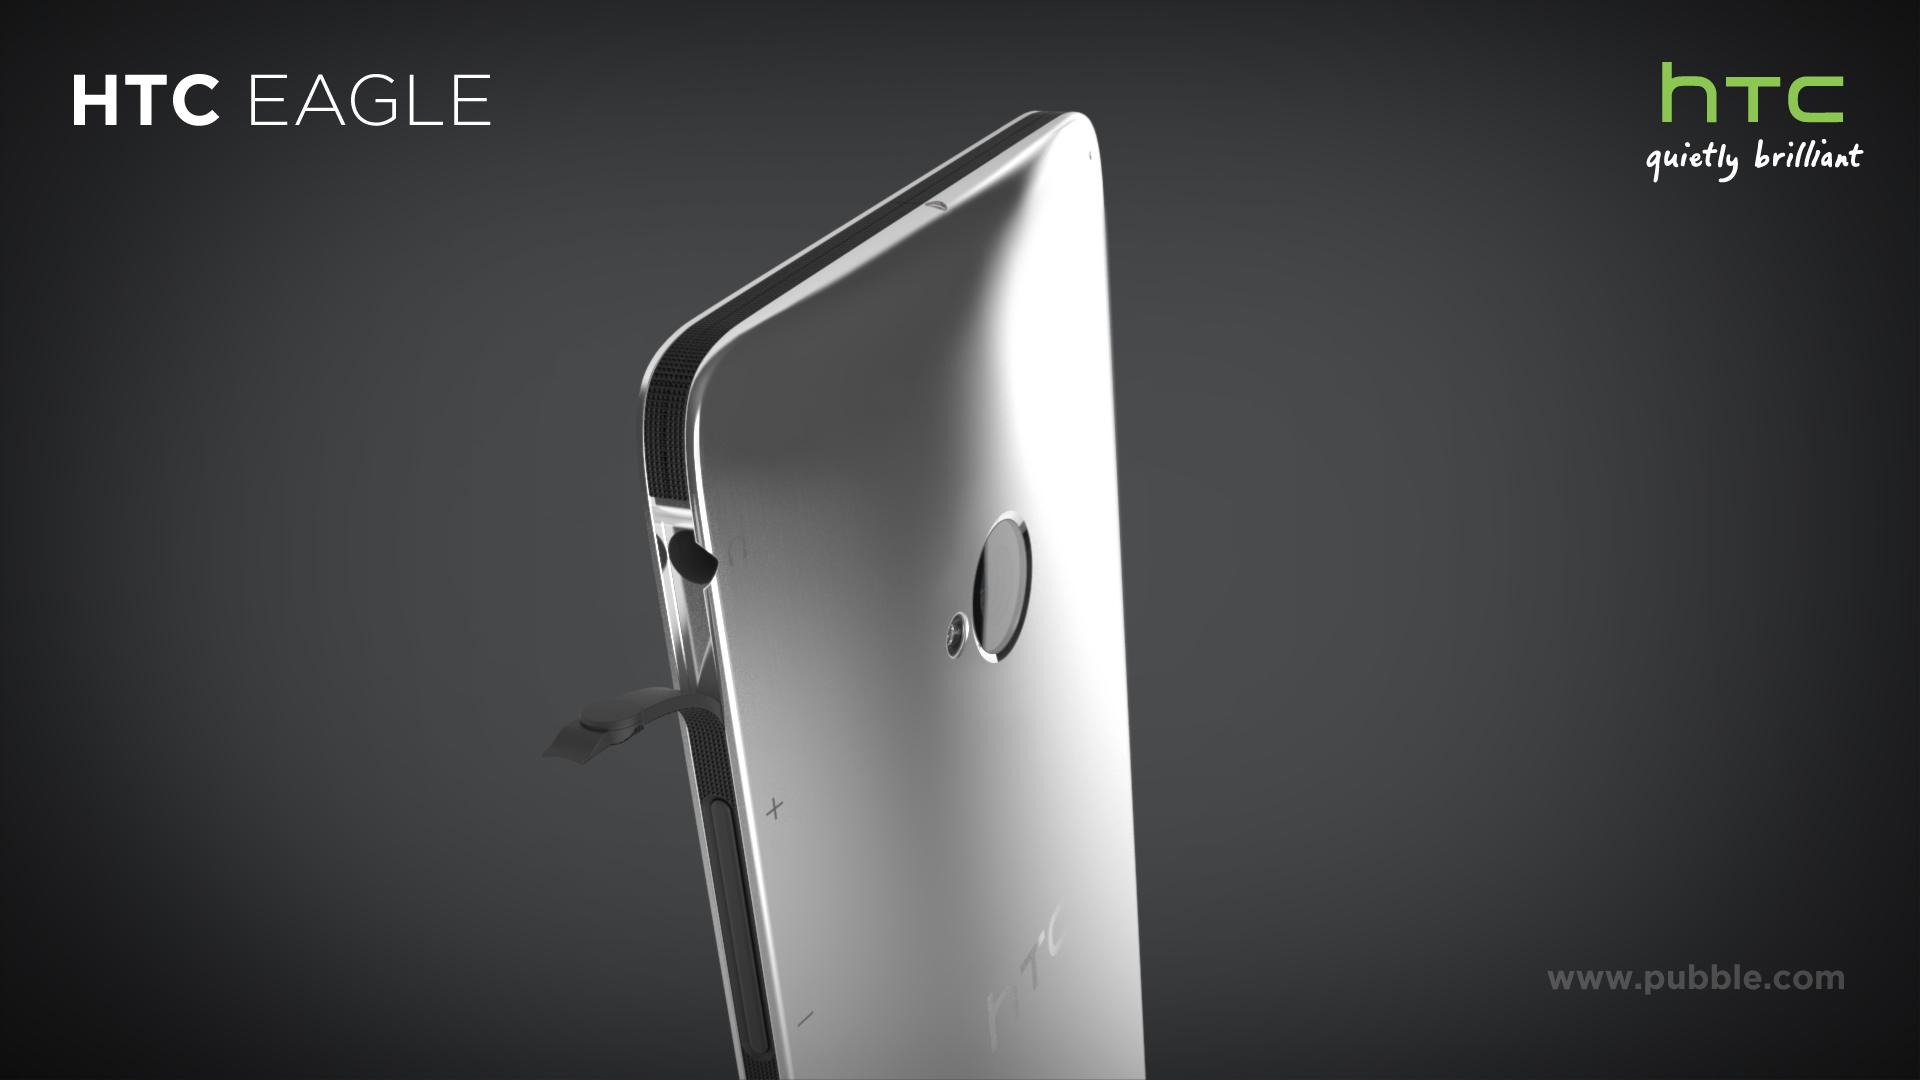 HTC Eagle - APN 4